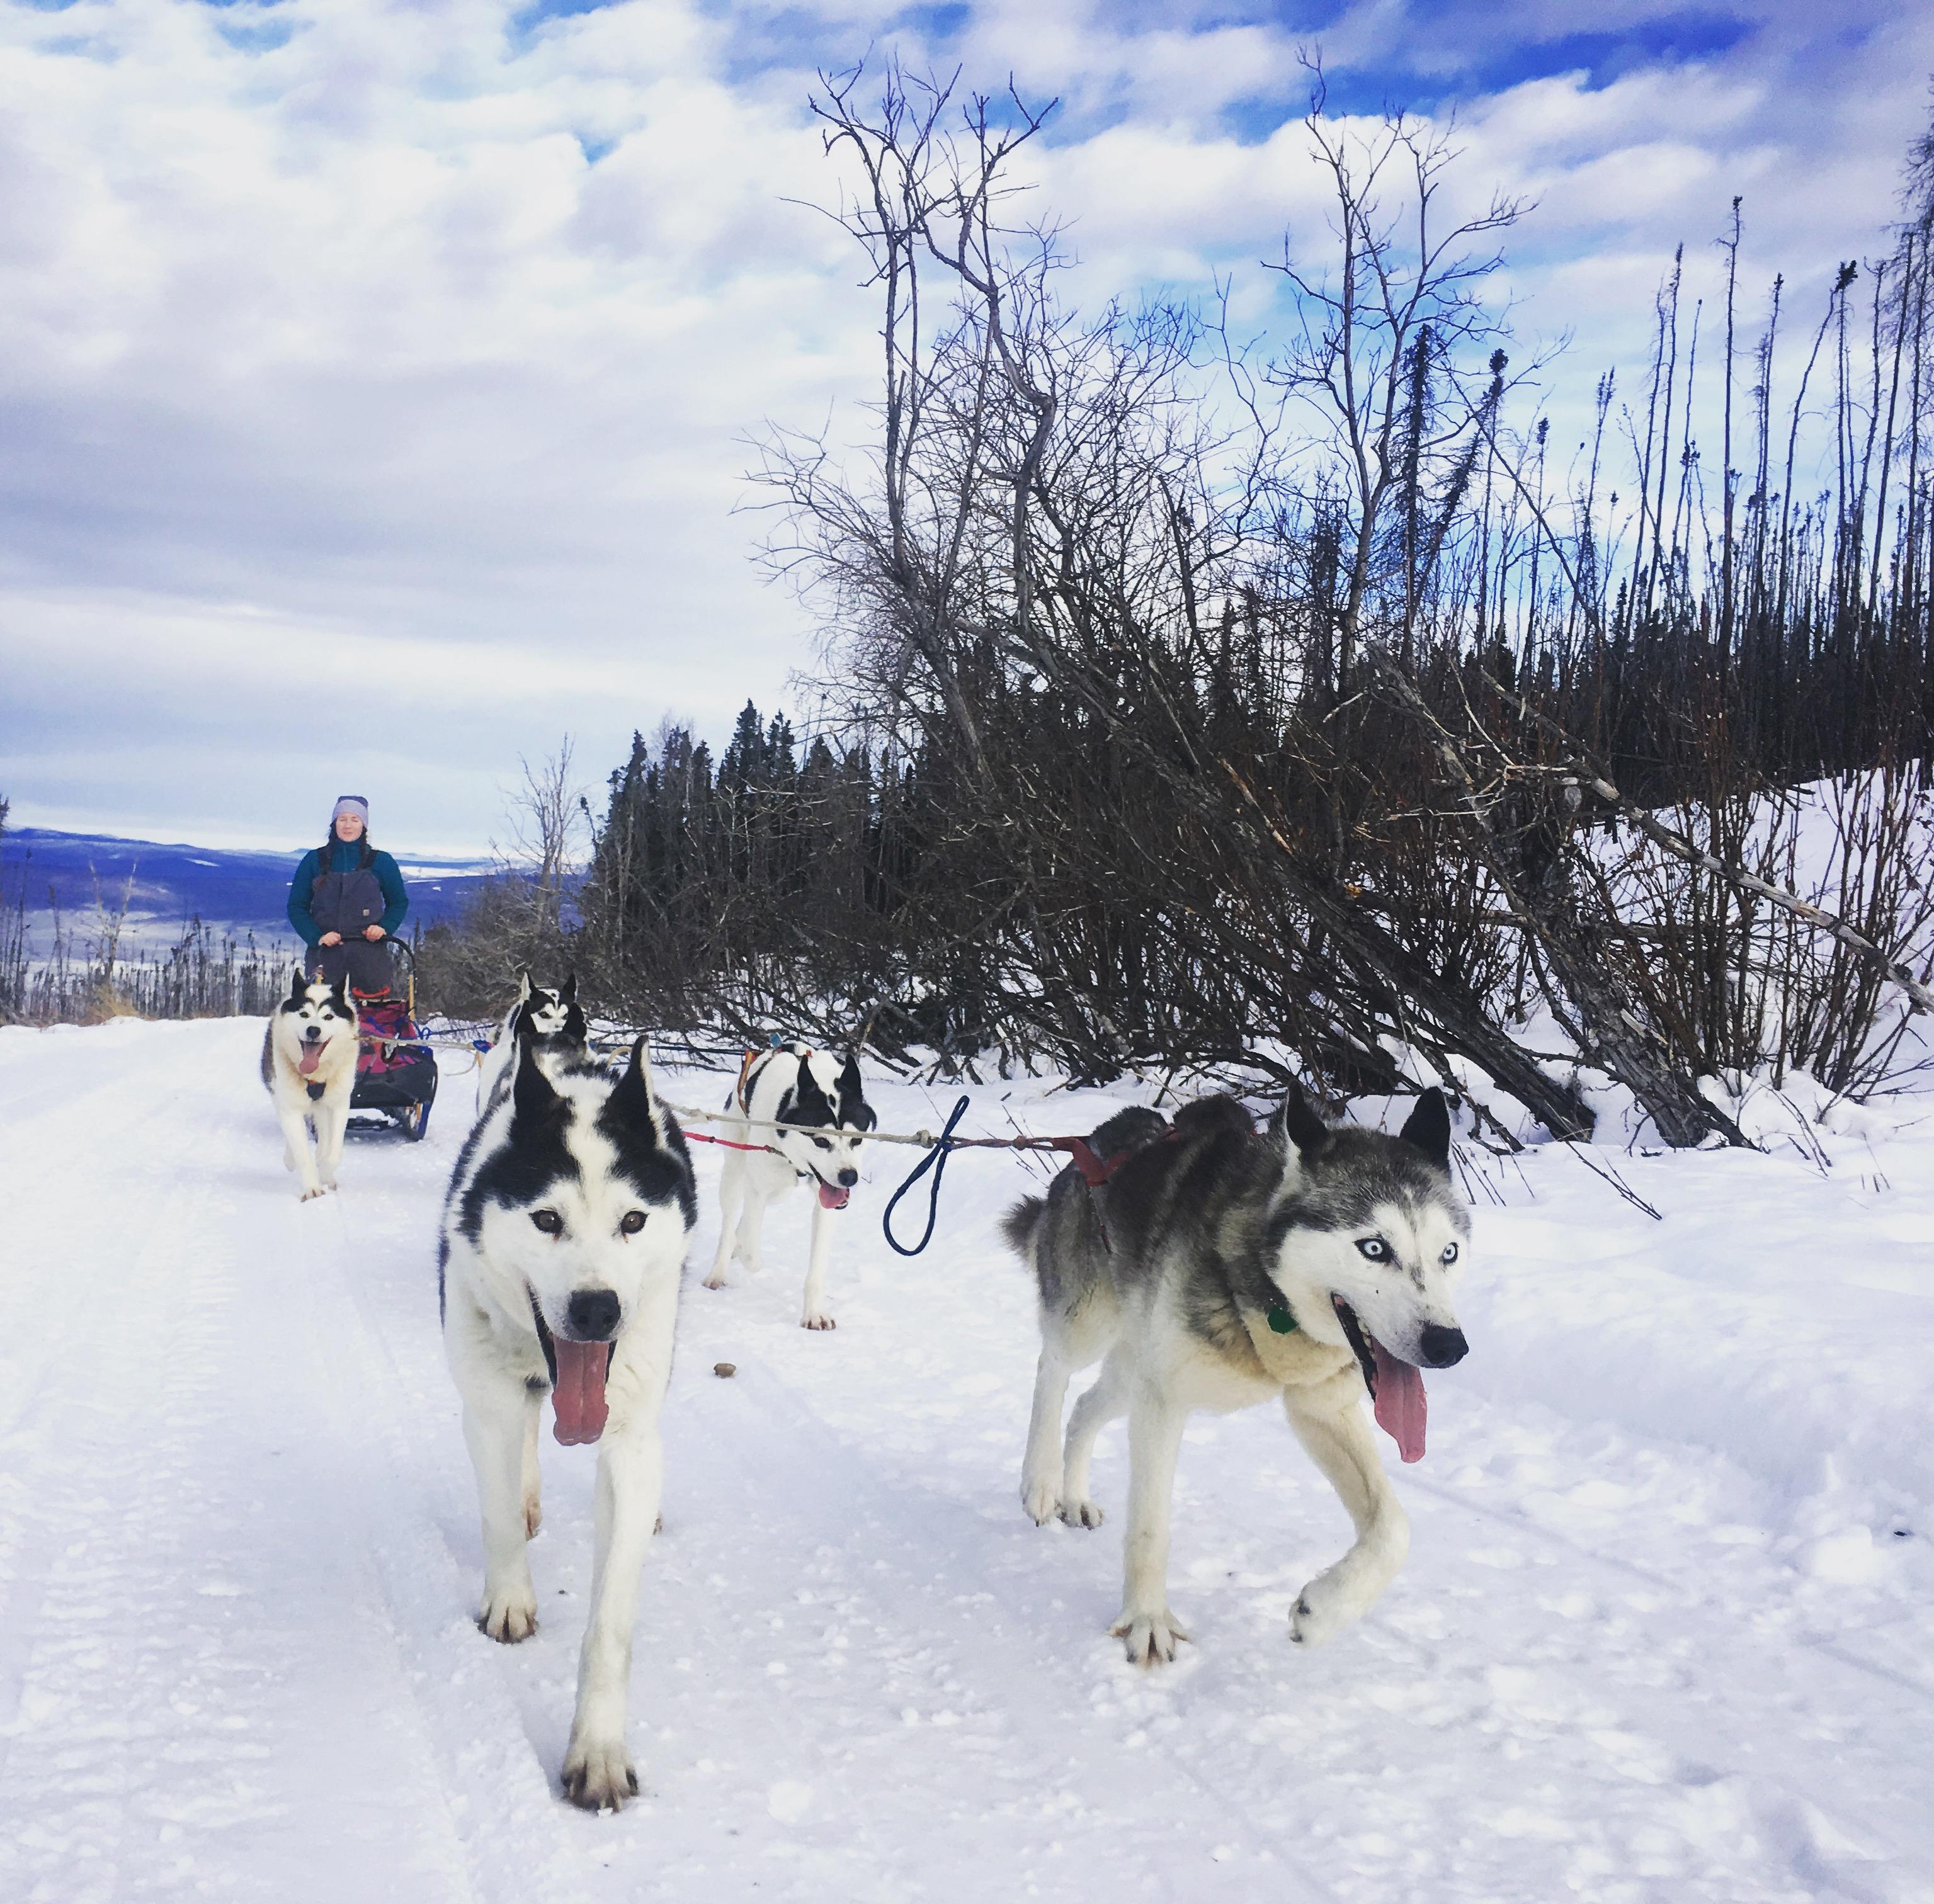 Mushing in Fairbanks